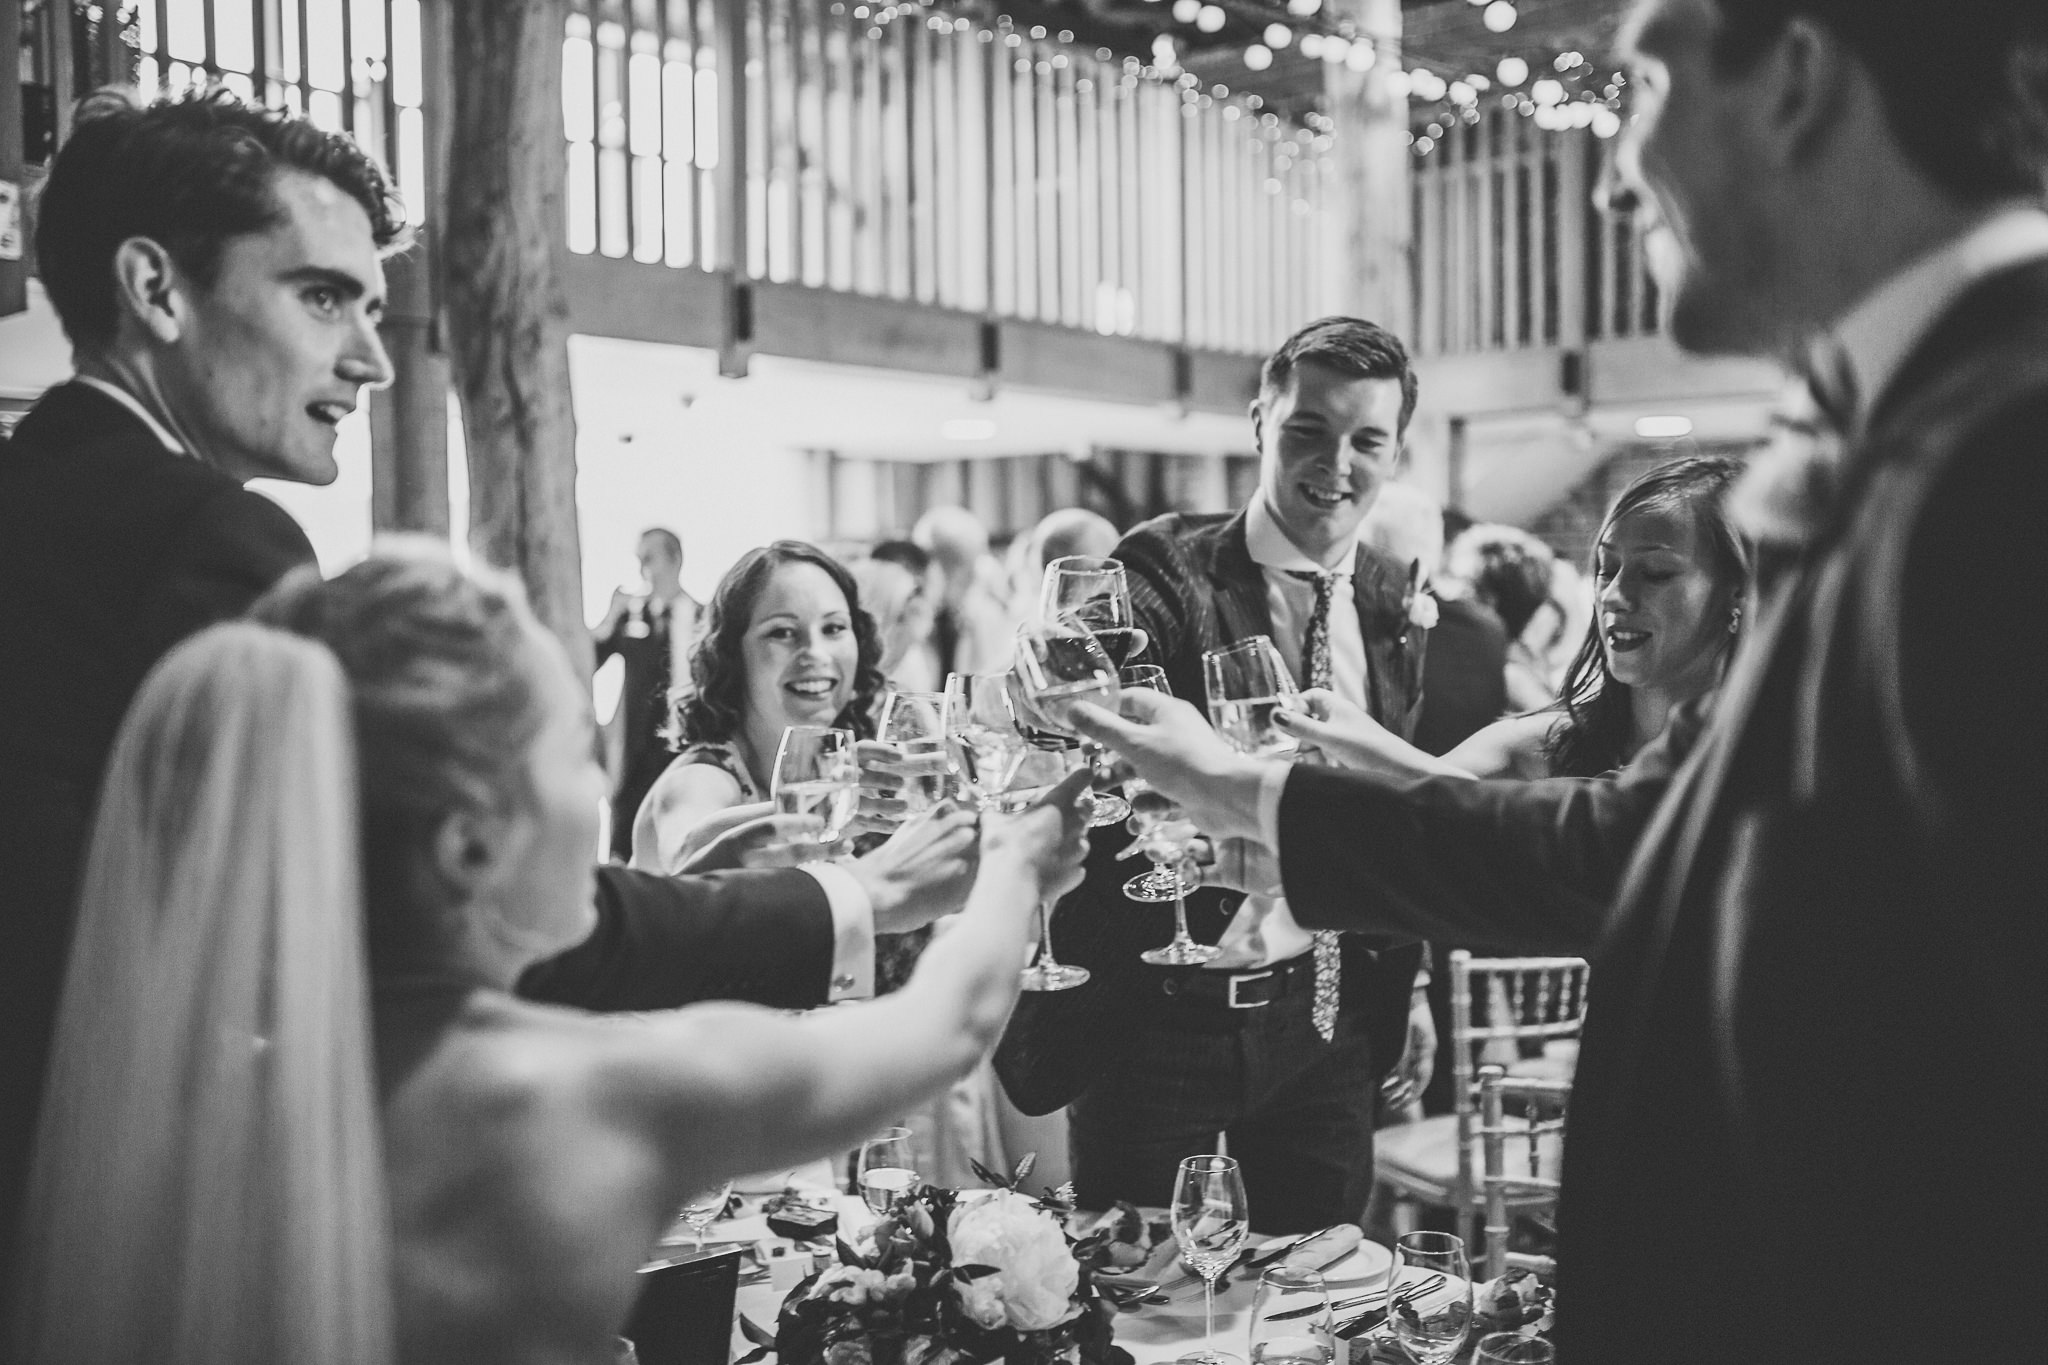 paul-marbrook-Gaynes-Park Wedding-Photographer-90105